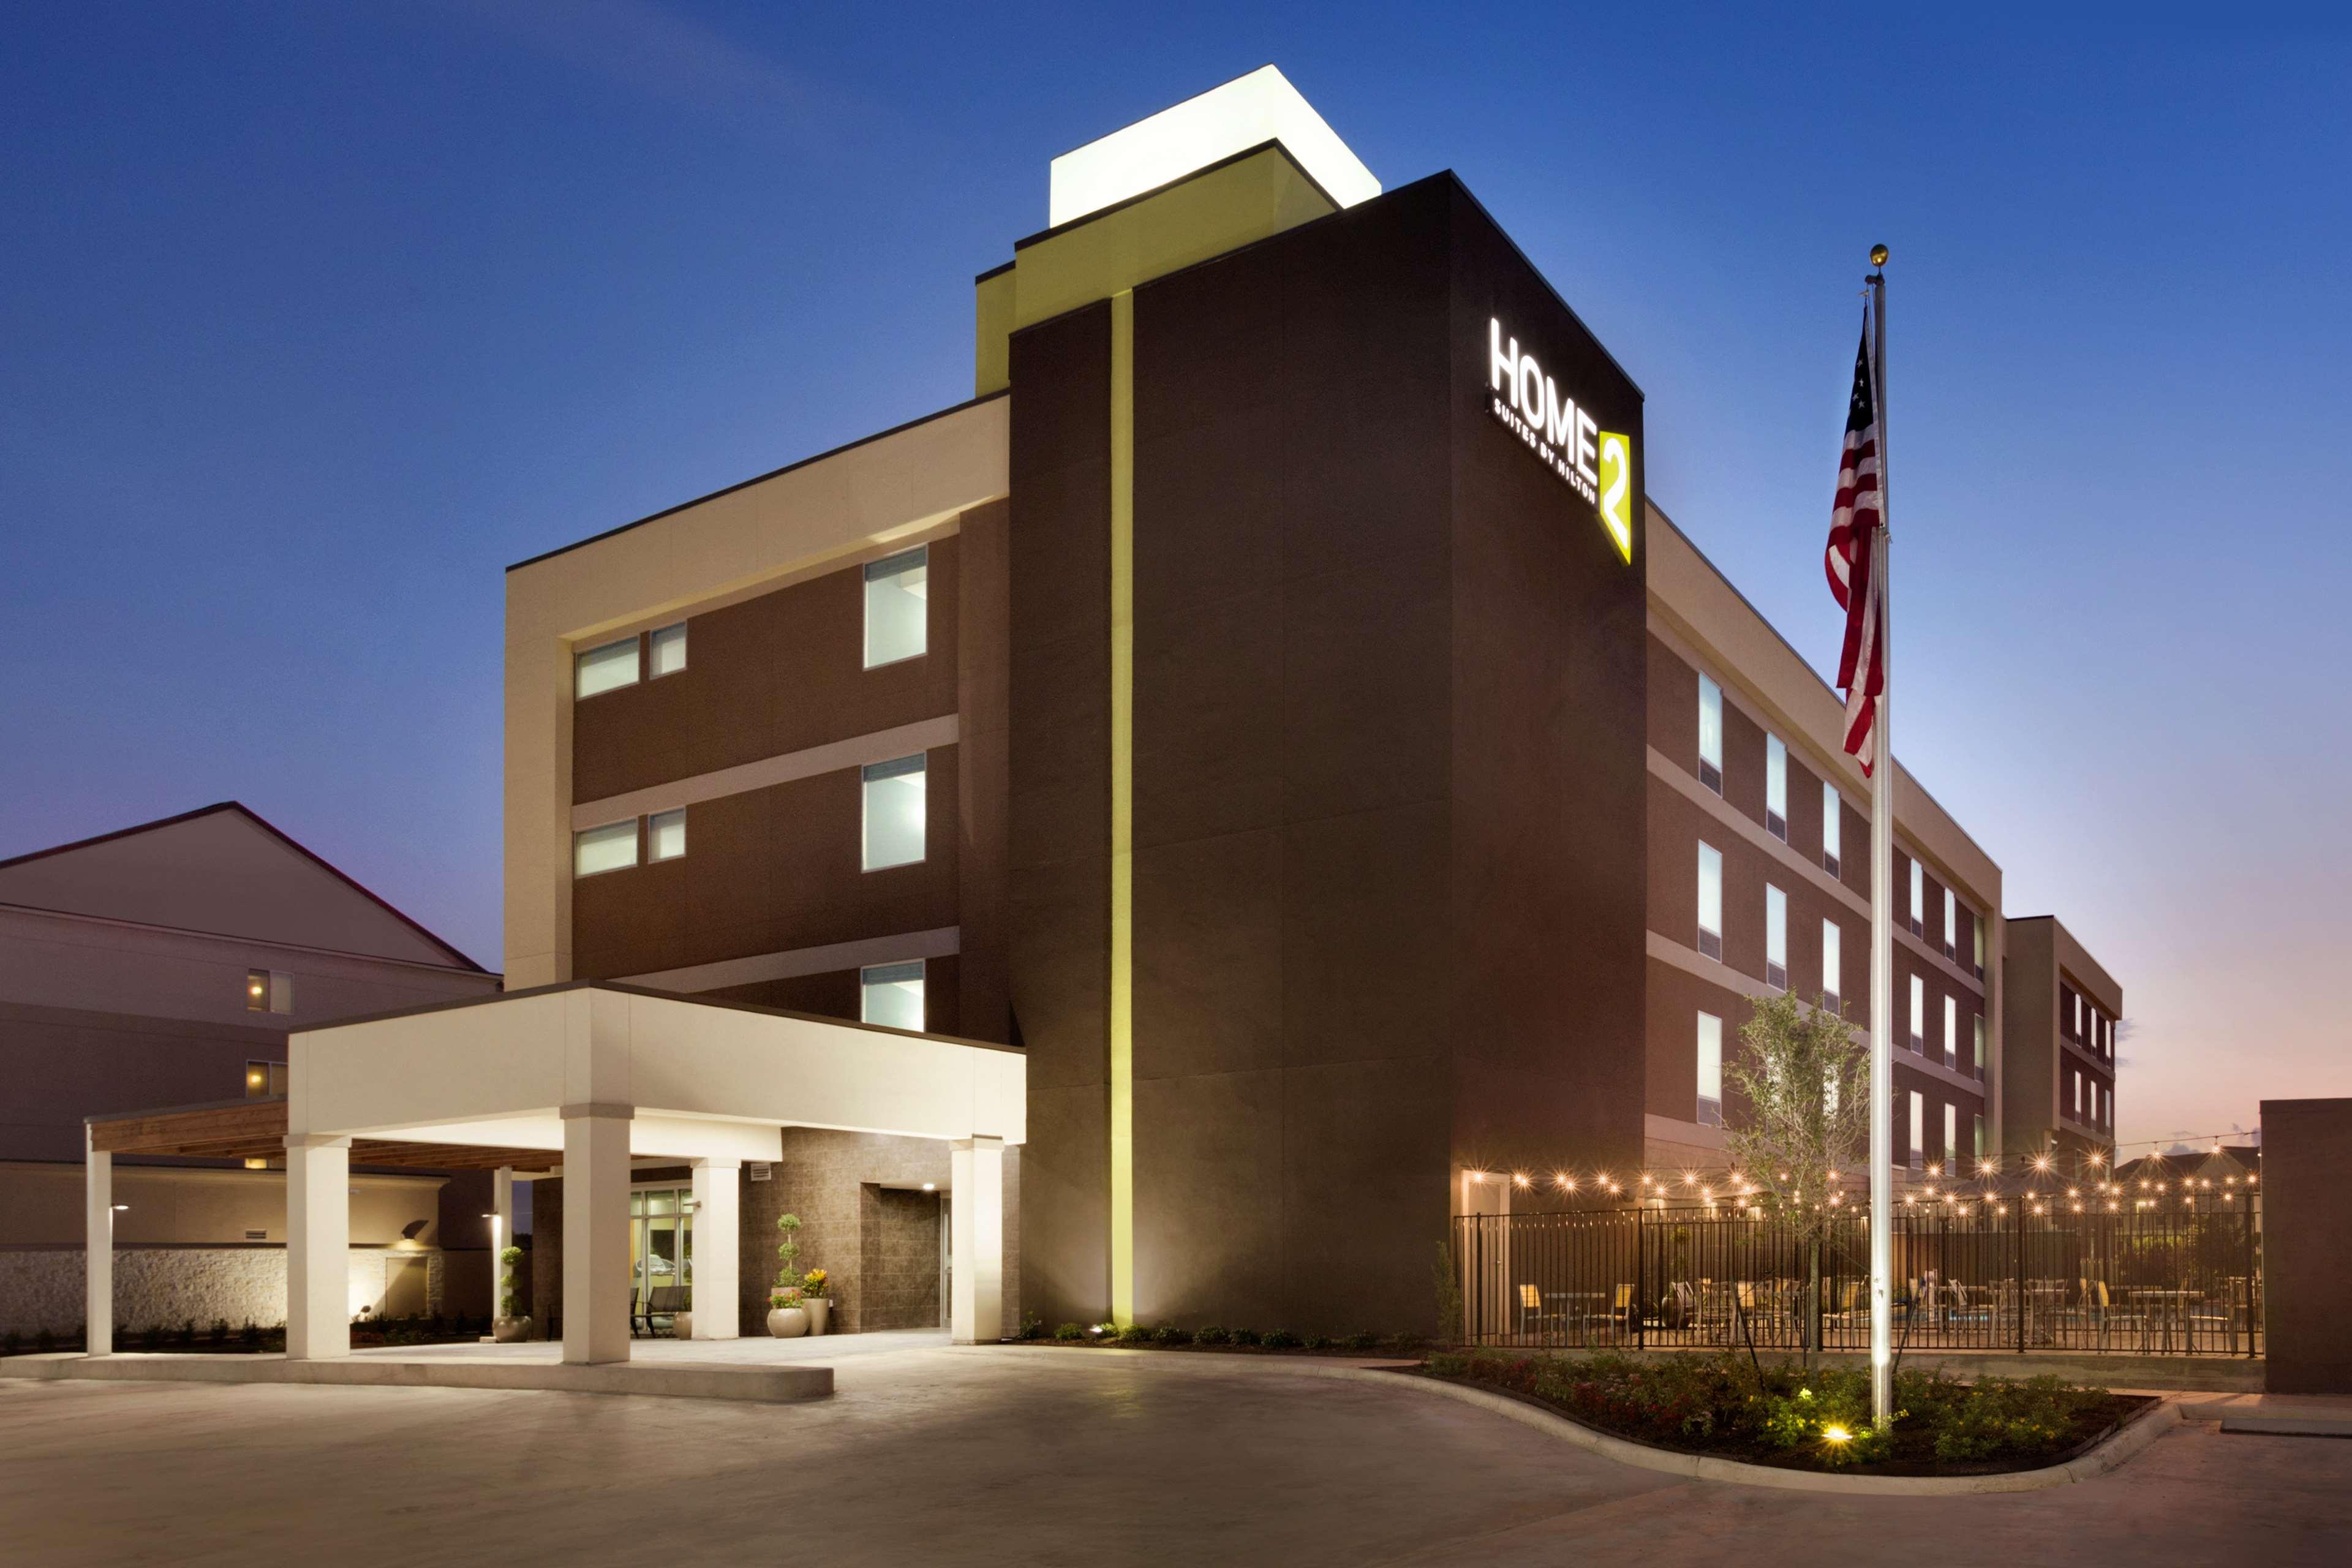 Home2 Suites by Hilton Houston/Webster image 1